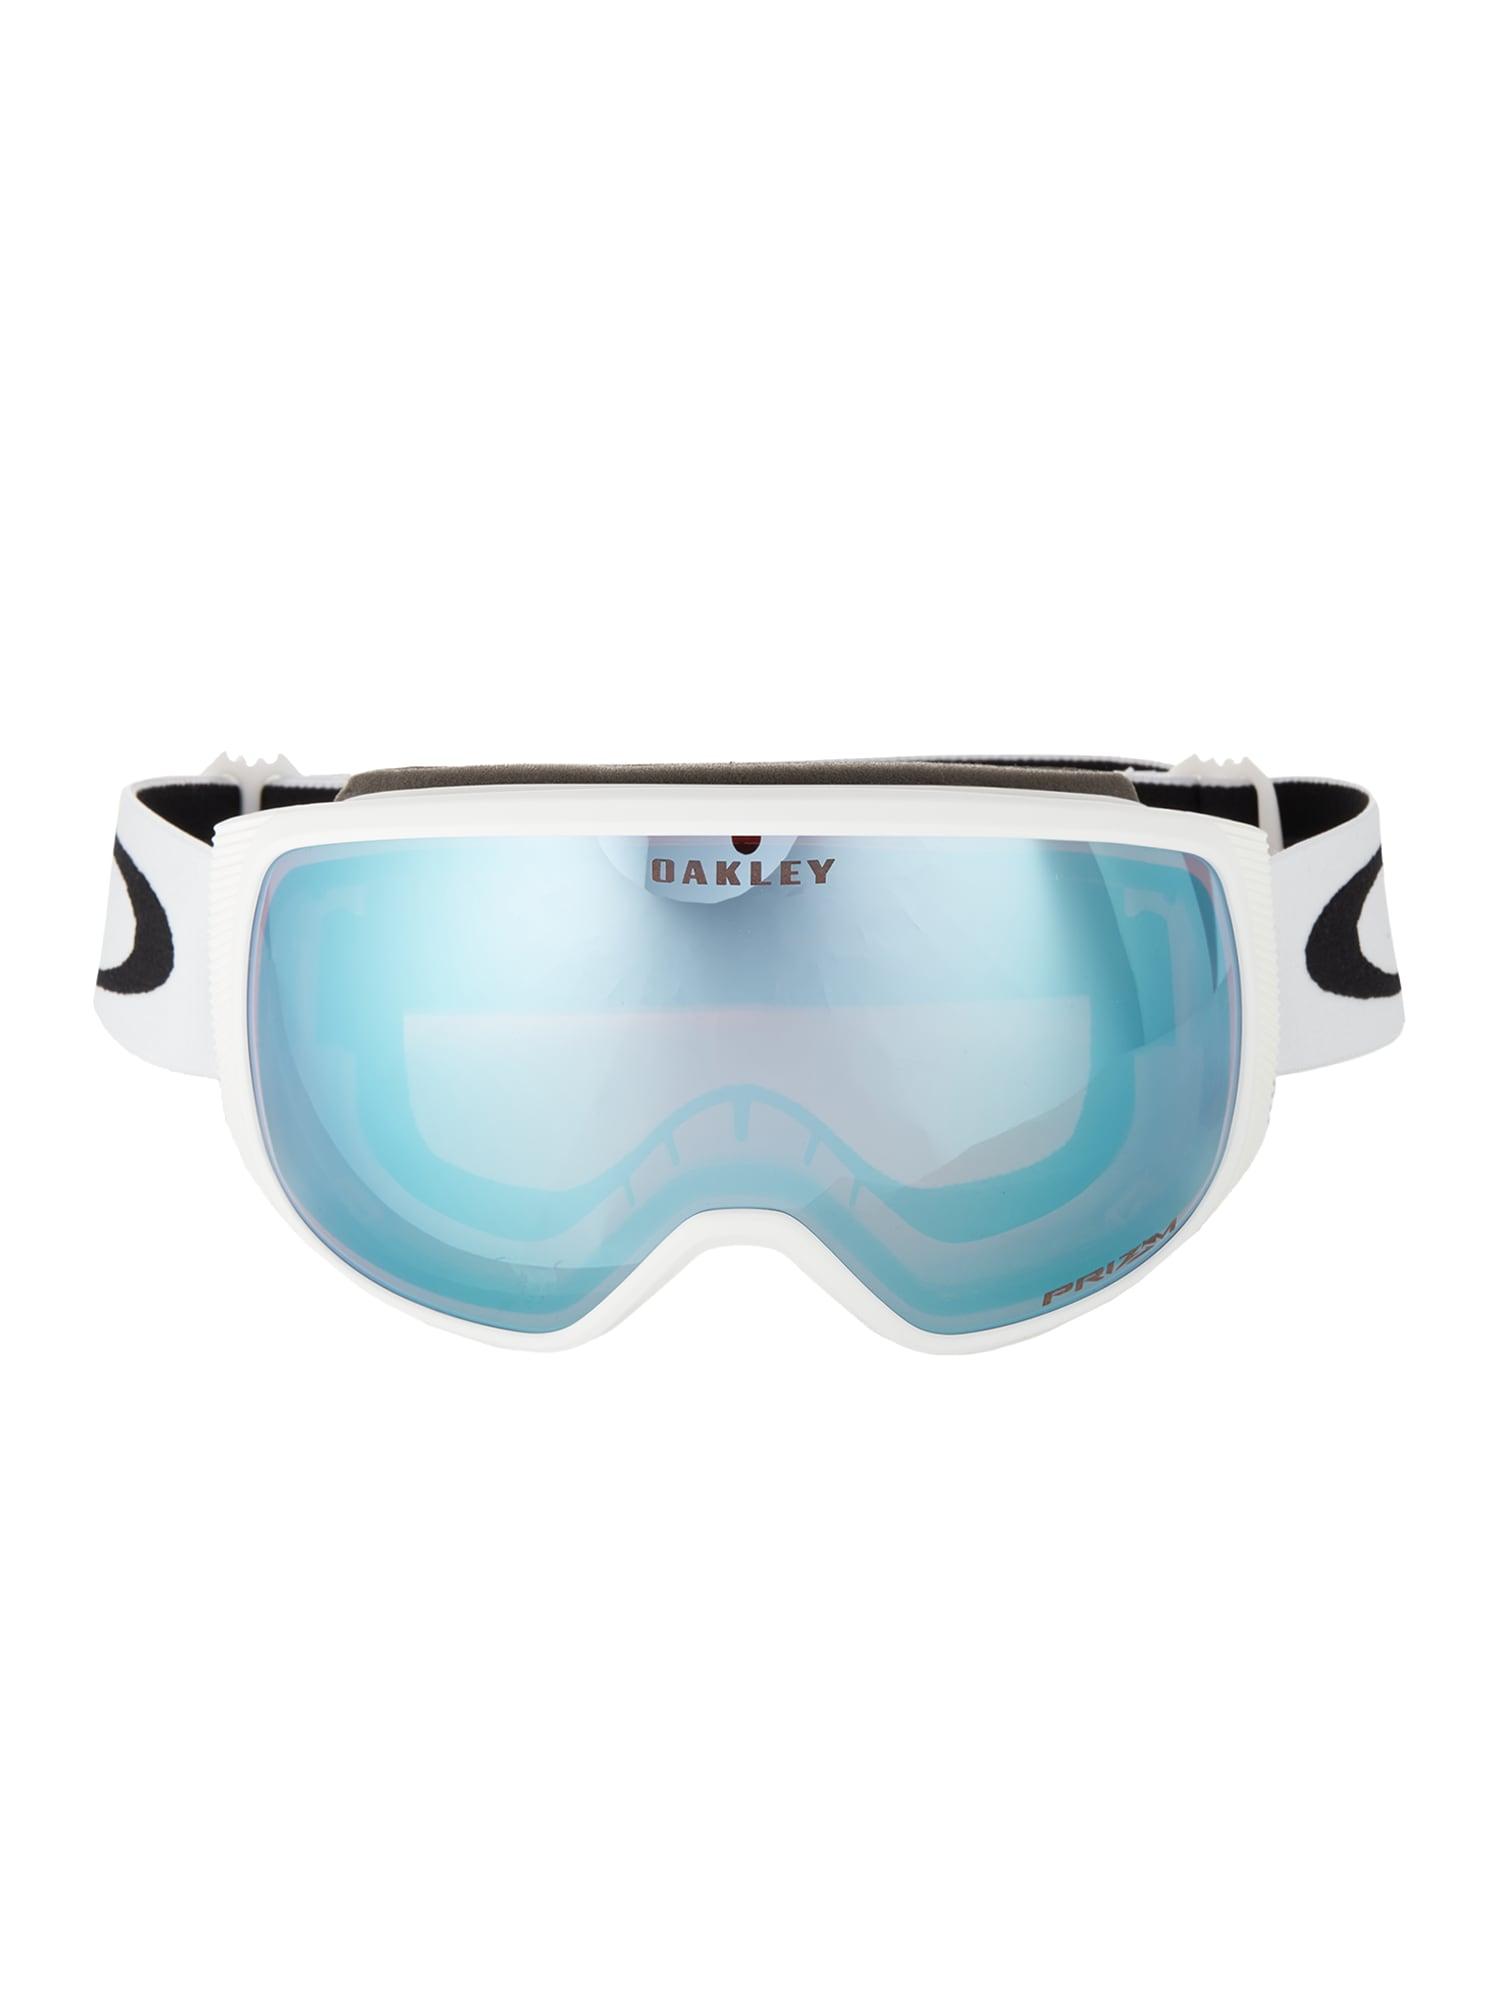 OAKLEY Sportiniai akiniai 'Flight Tracker M' safyro / balta